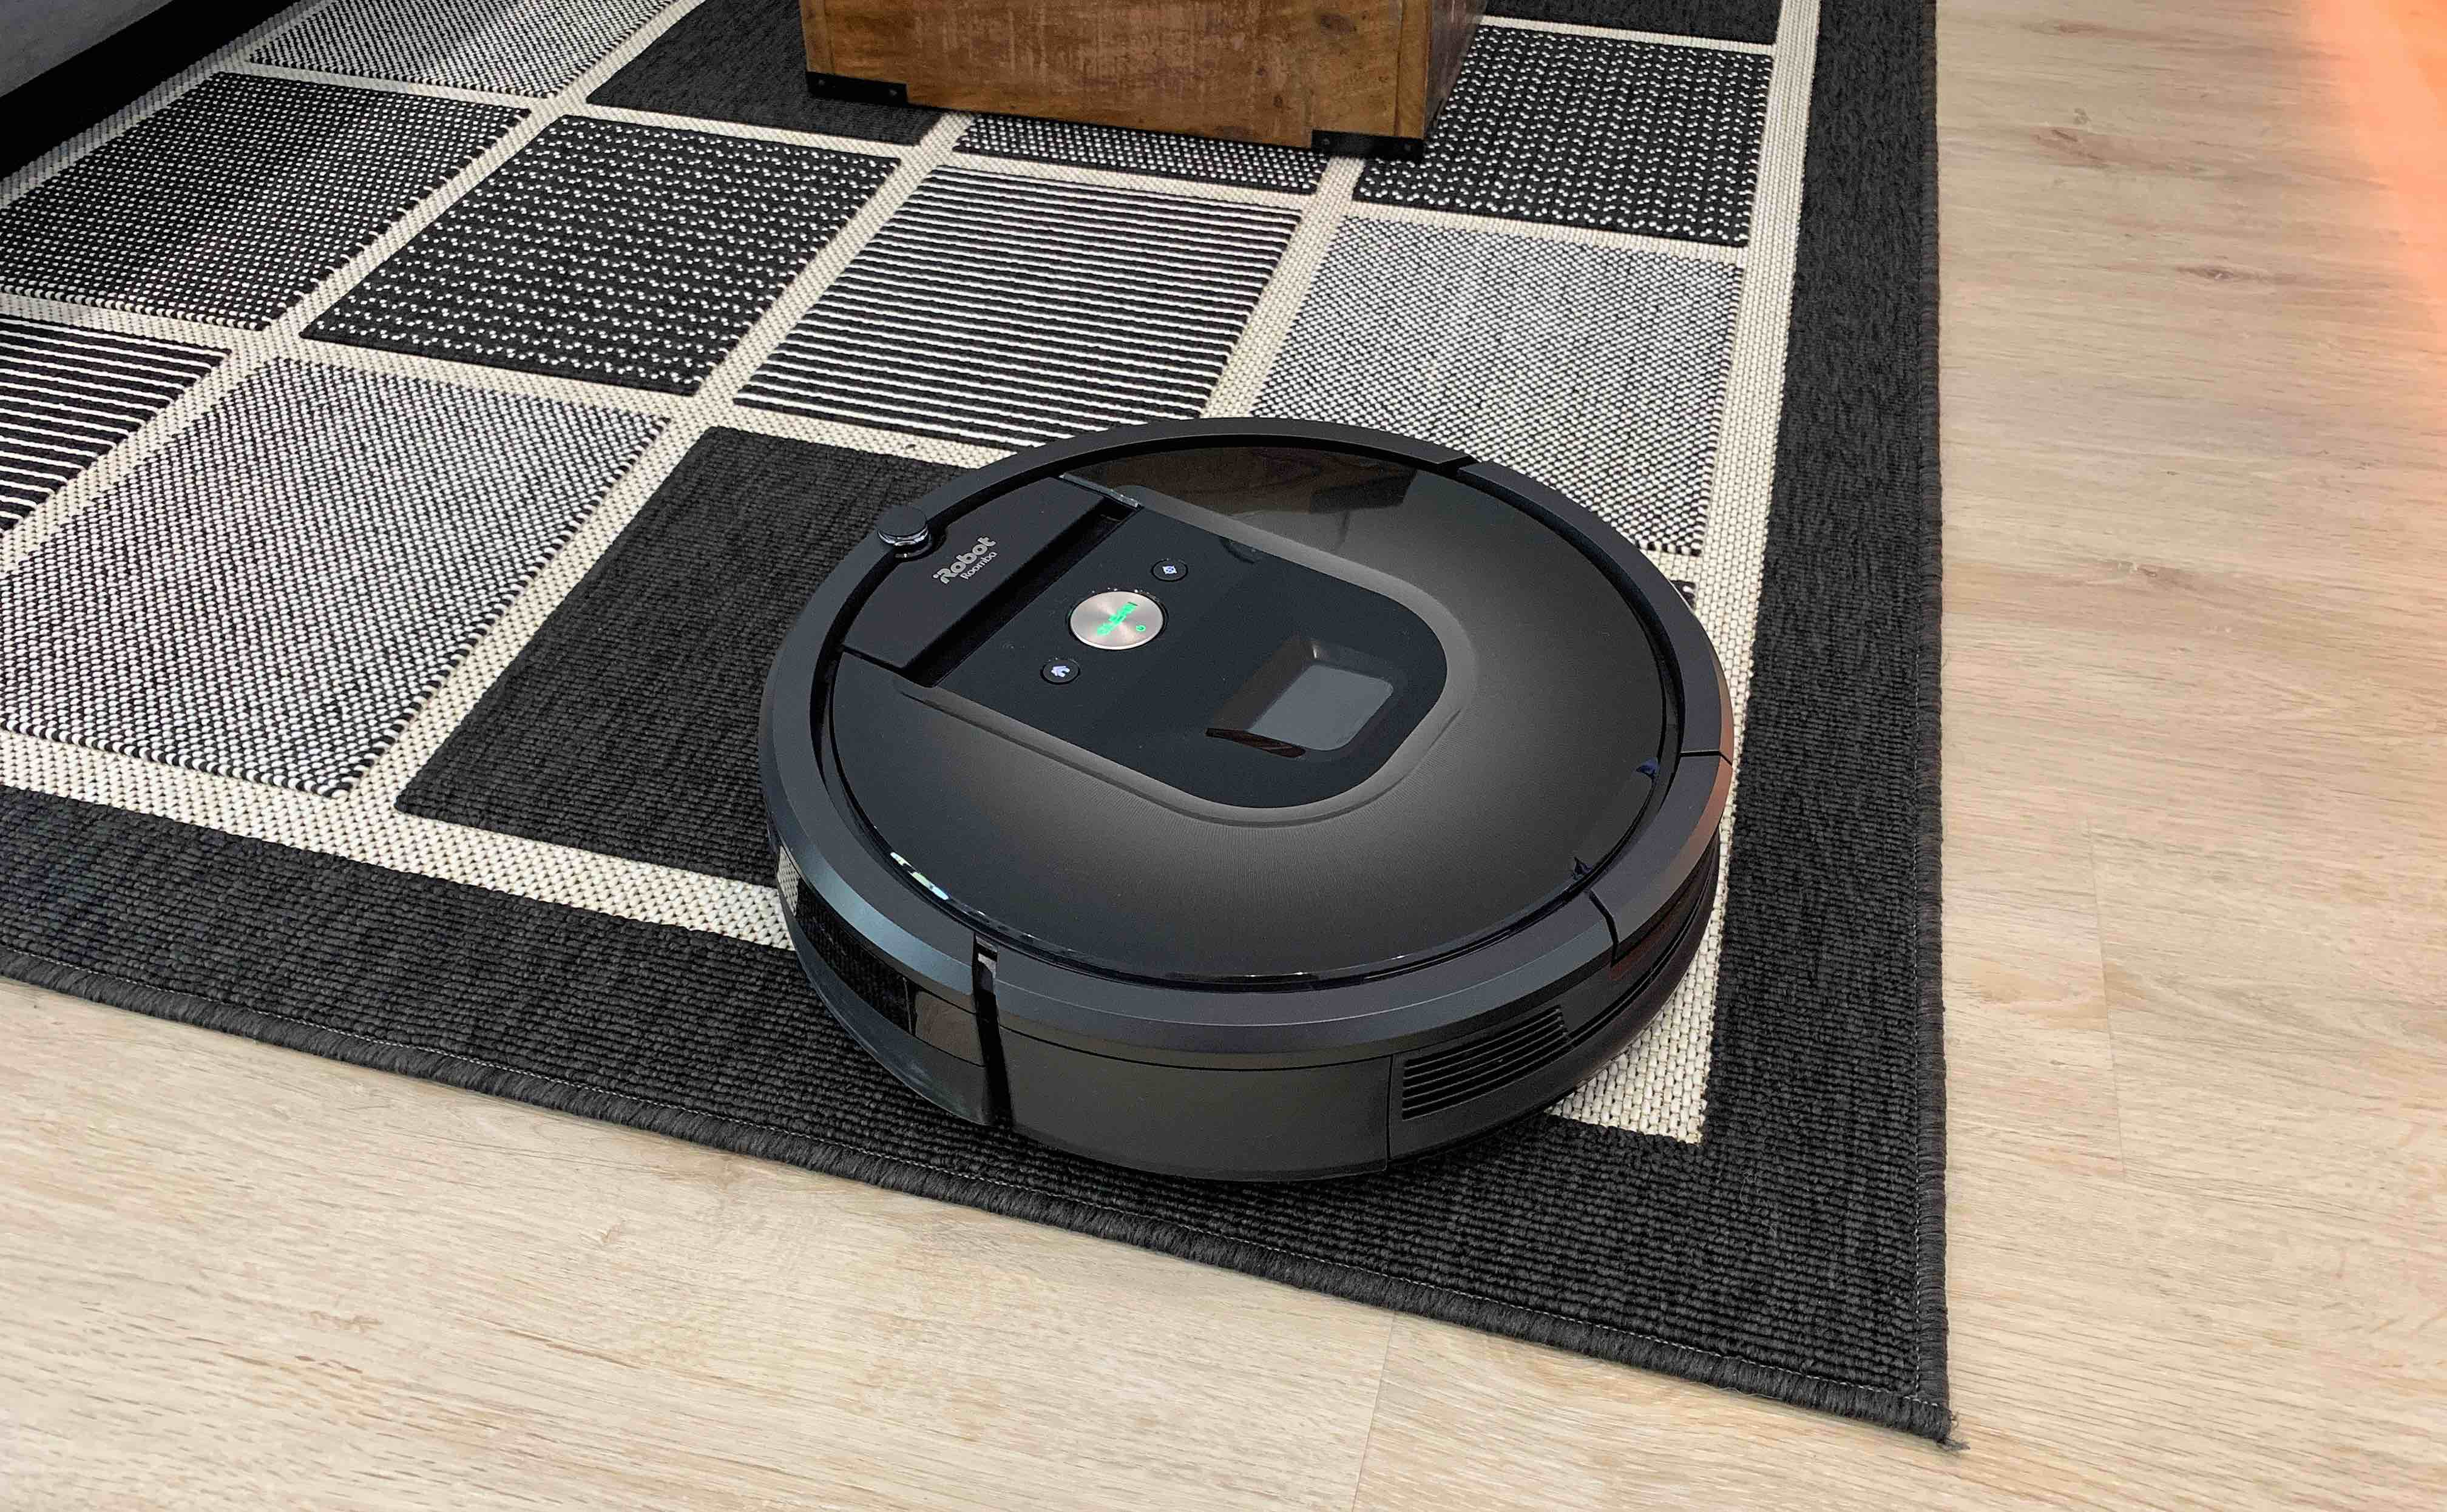 iRobot_Roomba_980_Roboter_SmartHome_Review4 iRobot Roomba 980 - intelligent, zuverlässig und akkurat das Heim saugen lassen